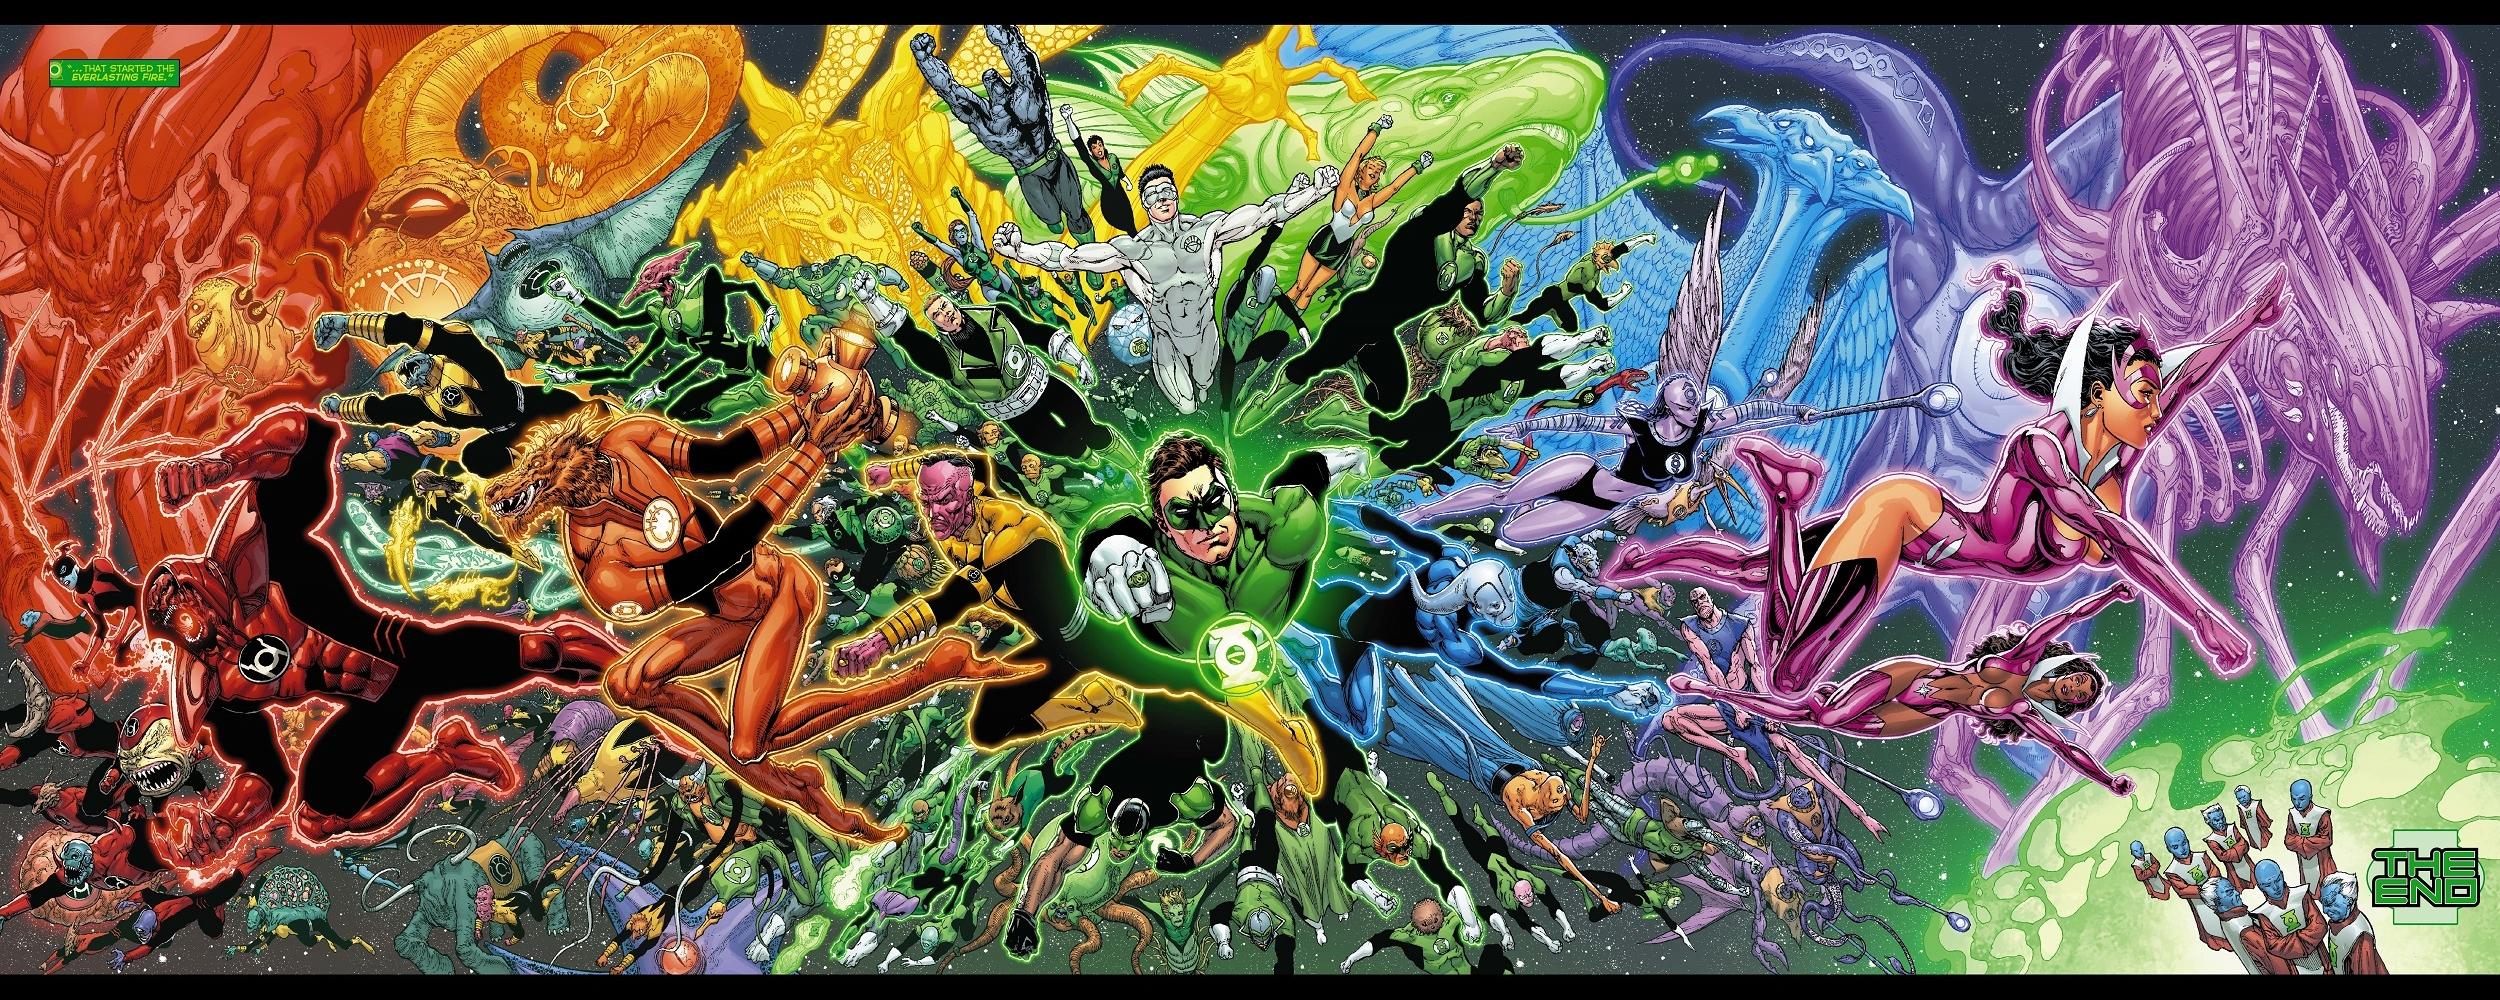 Lantern Corps Comic Comics Green Lantern Corps Superhero Wallpaper 2500x1000